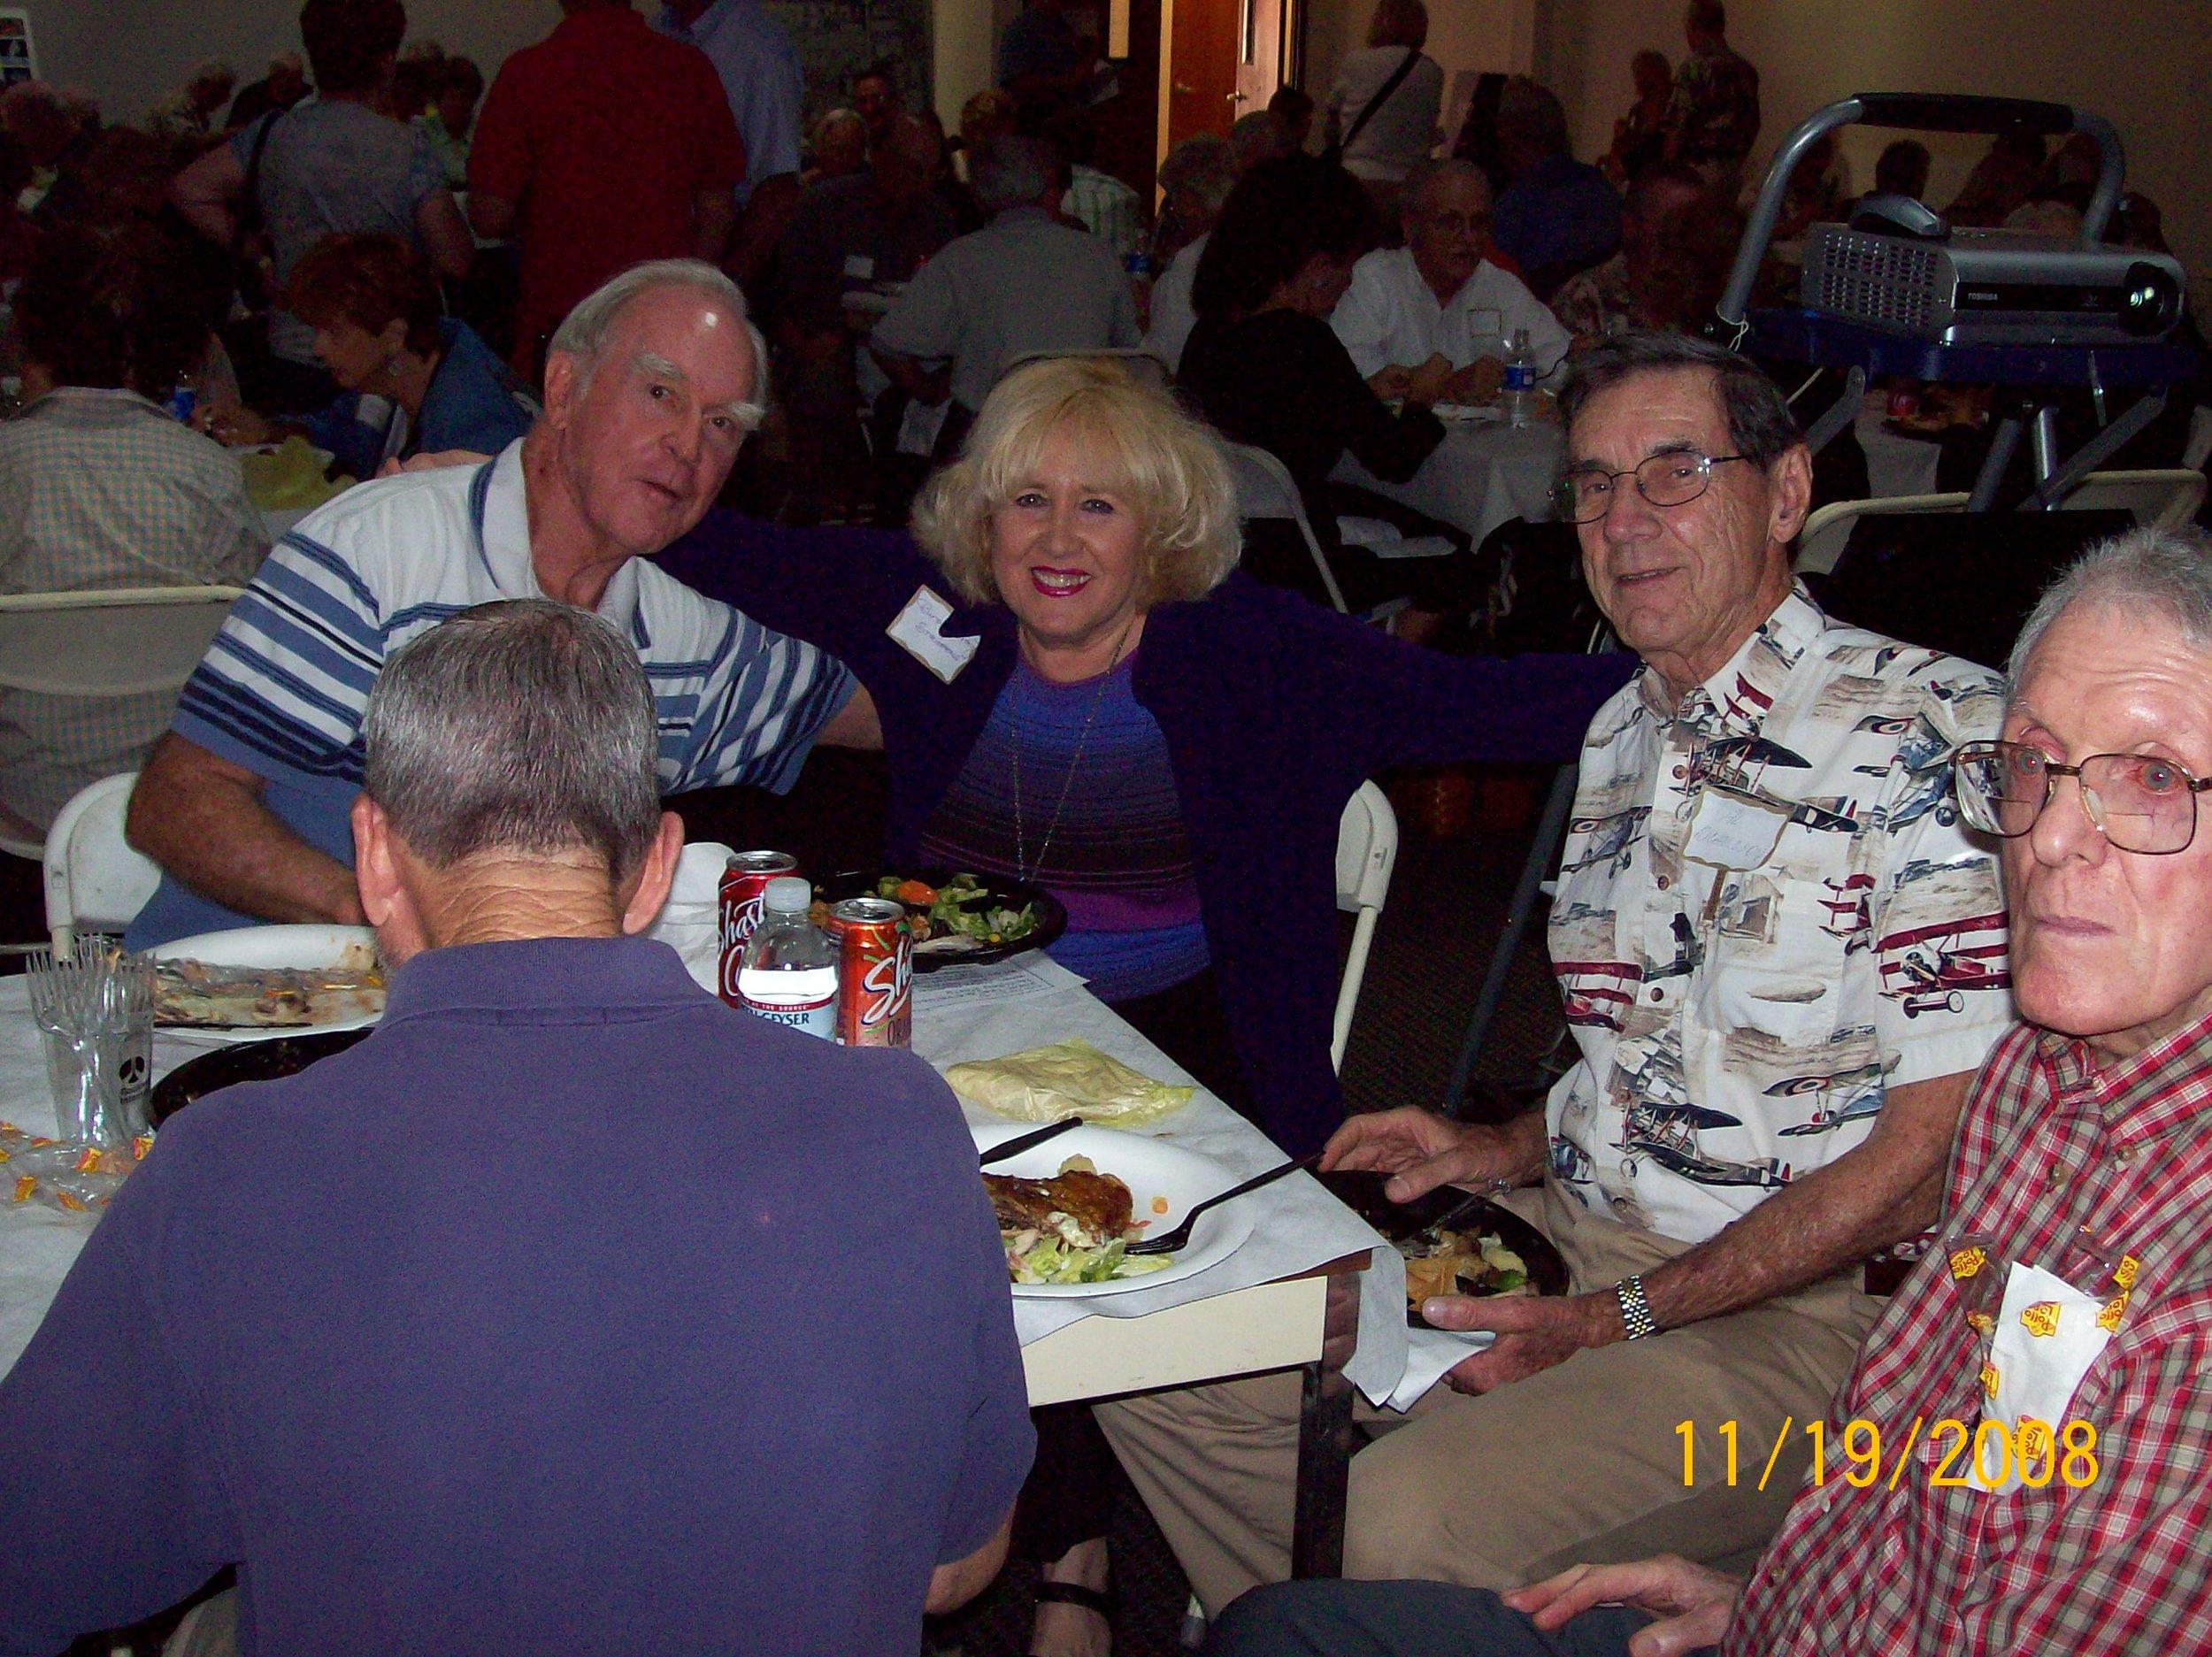 alf luncheon 11 19 2008 044.jpg